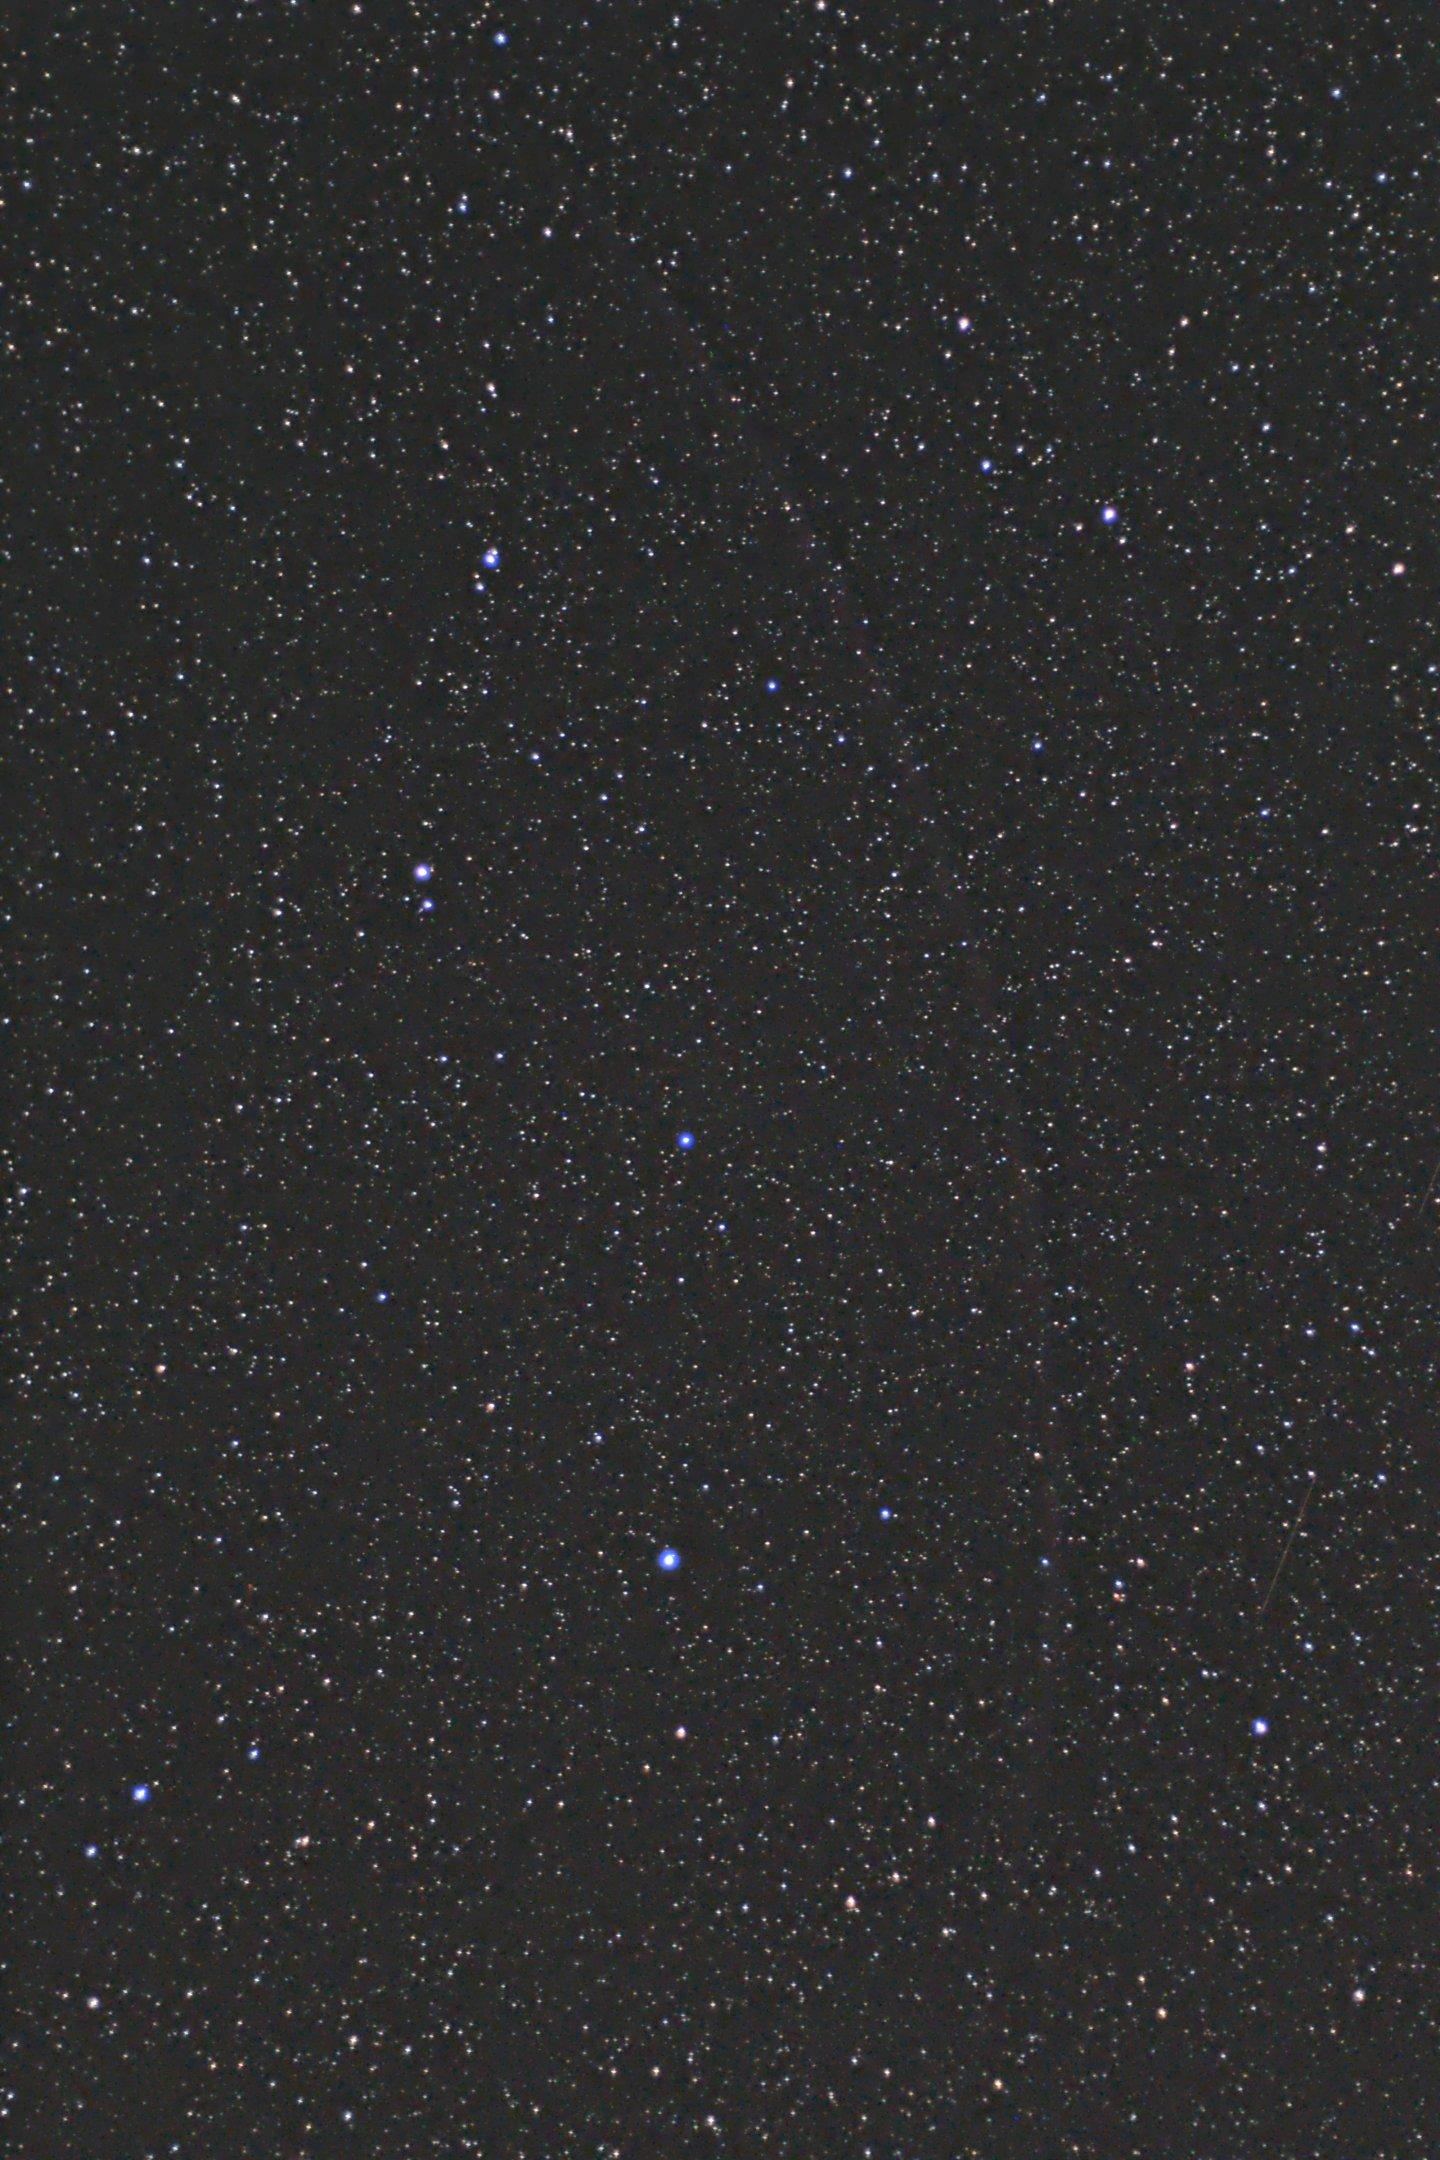 leo 20190411 50mm 300s.jpg